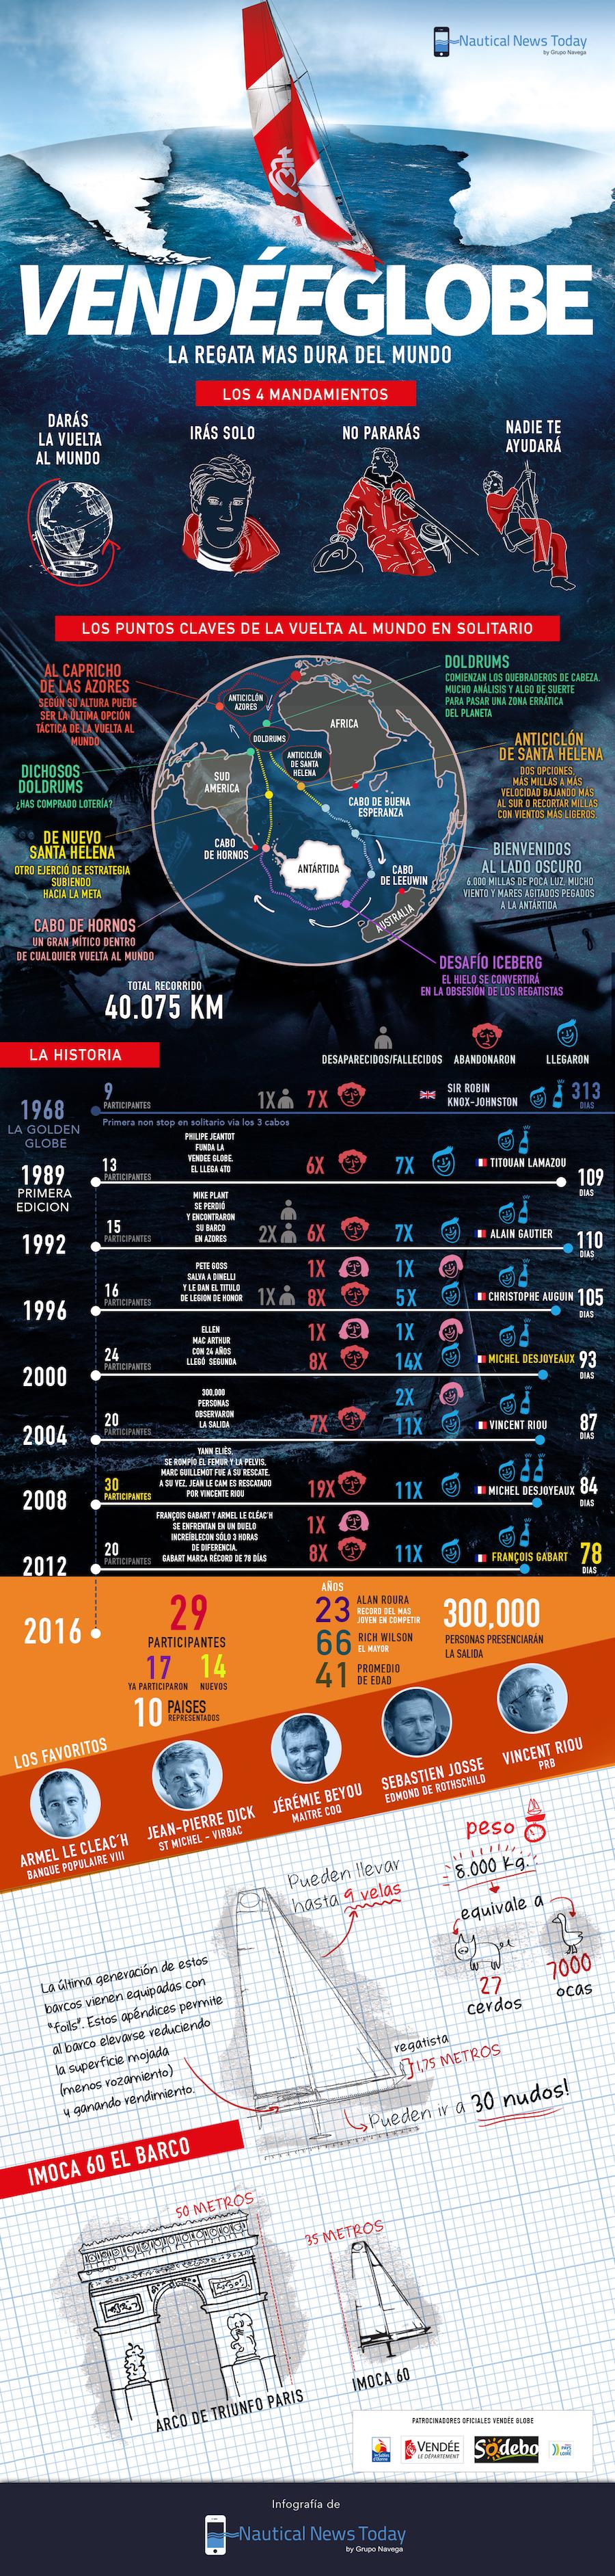 infografia-vendee-globe-2016-ppp